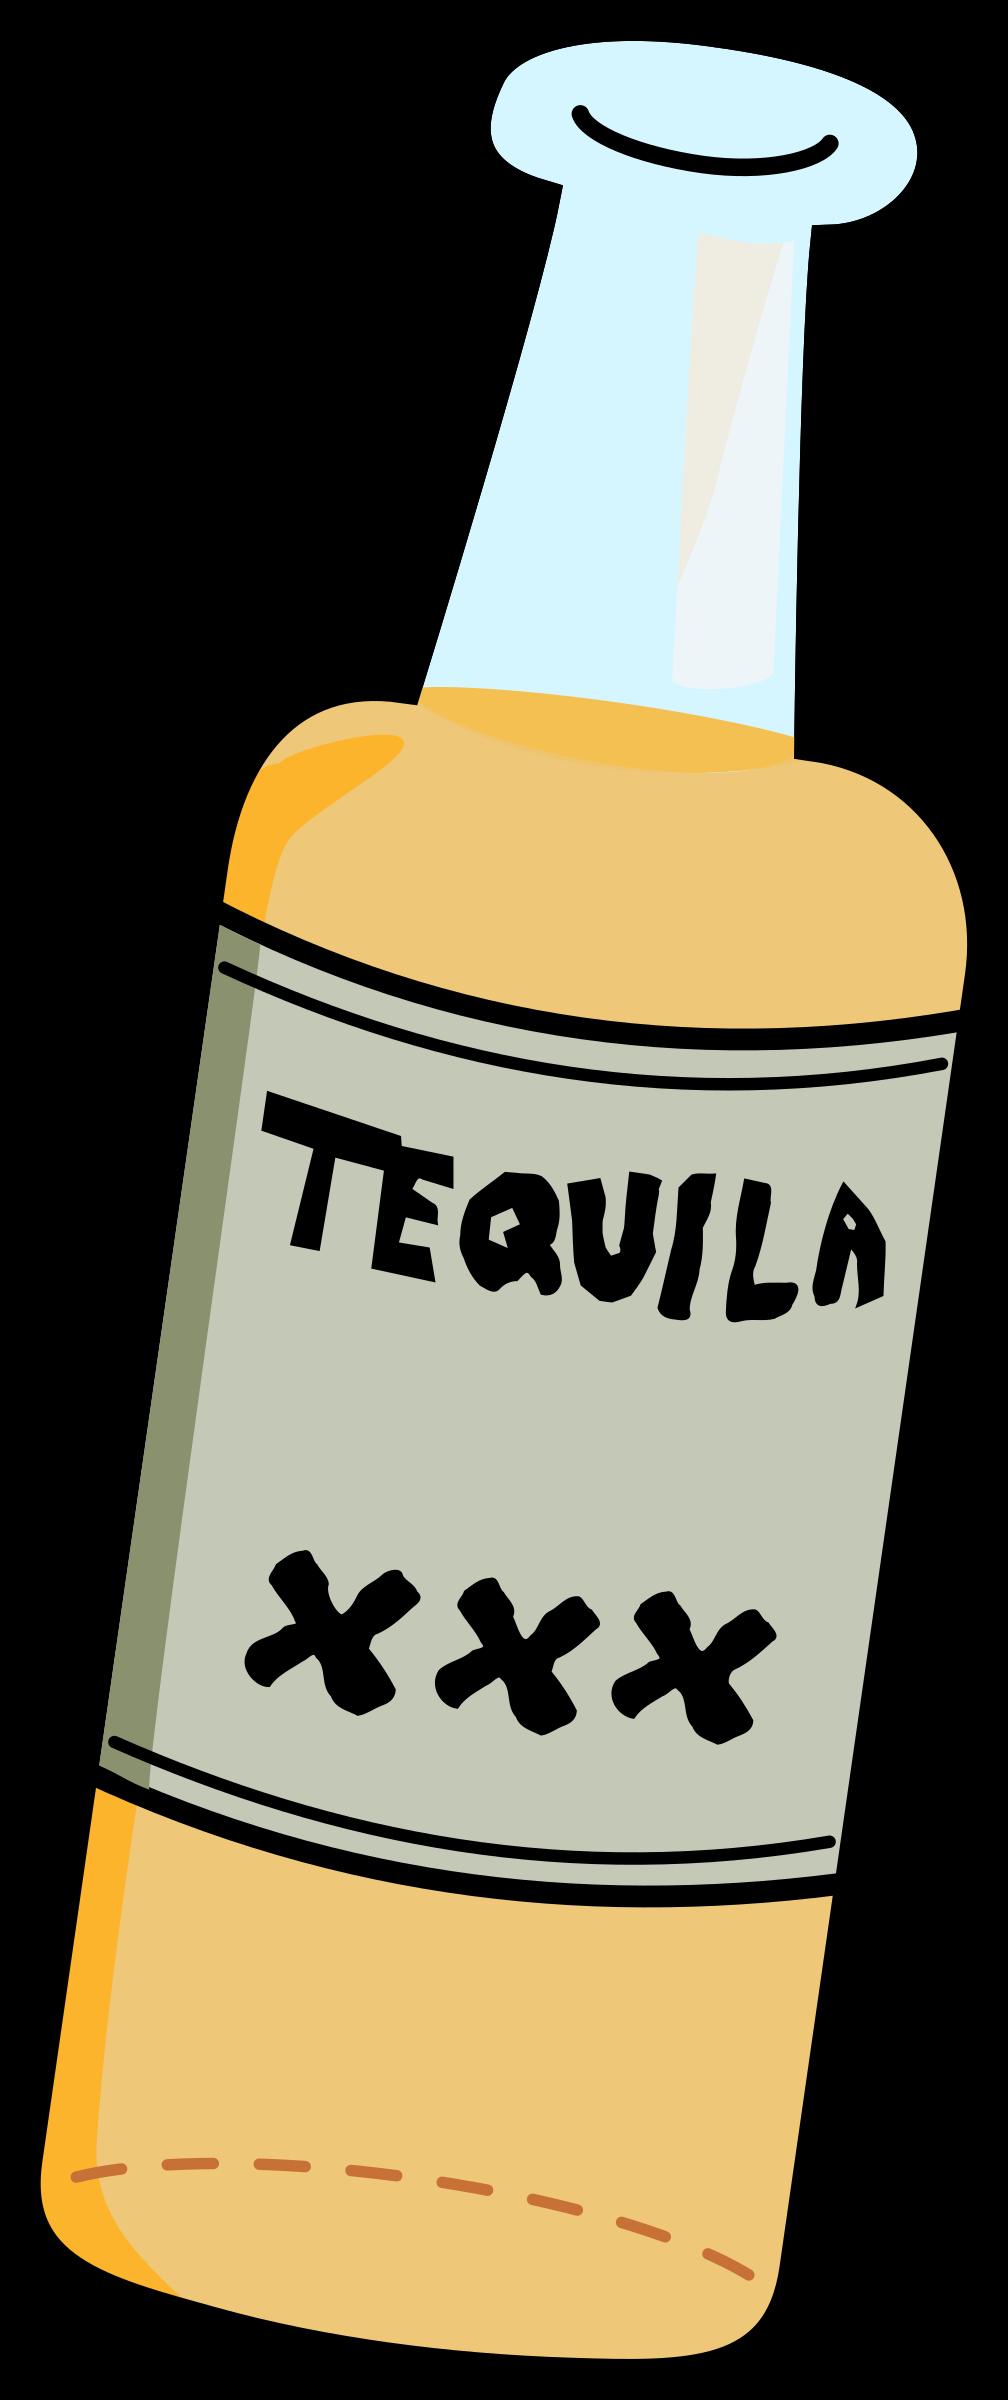 Tequila clipart Tequila Cartoon Cartoon Tequila Clipart